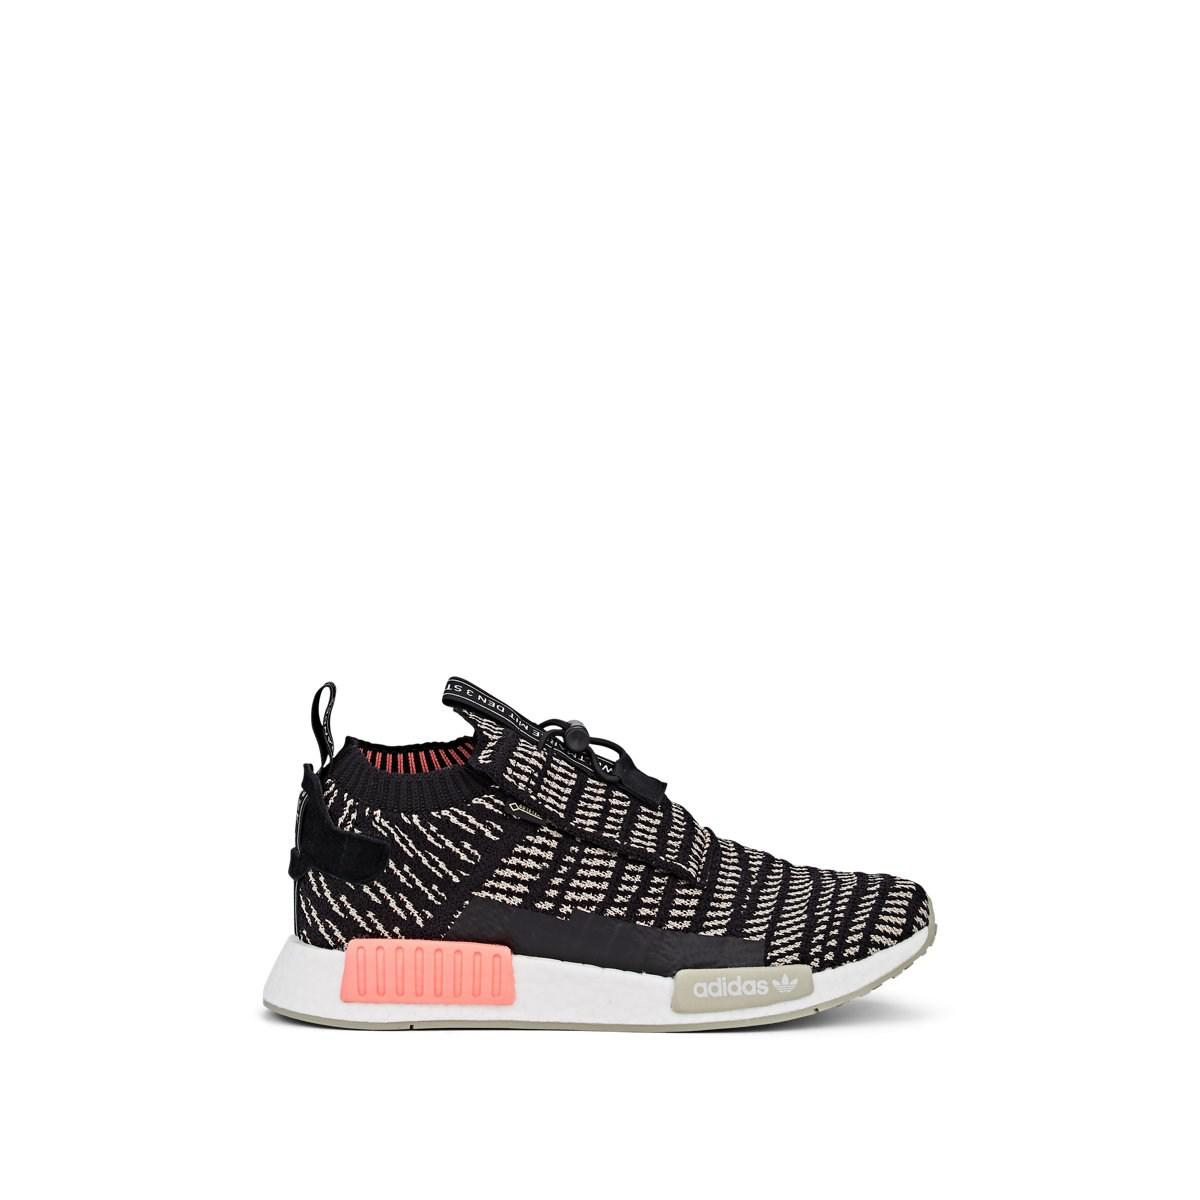 8d4761f4296e3a Adidas - Black Nmd Ts1 Pk Gtx Primeknit Sneakers for Men - Lyst. View  fullscreen